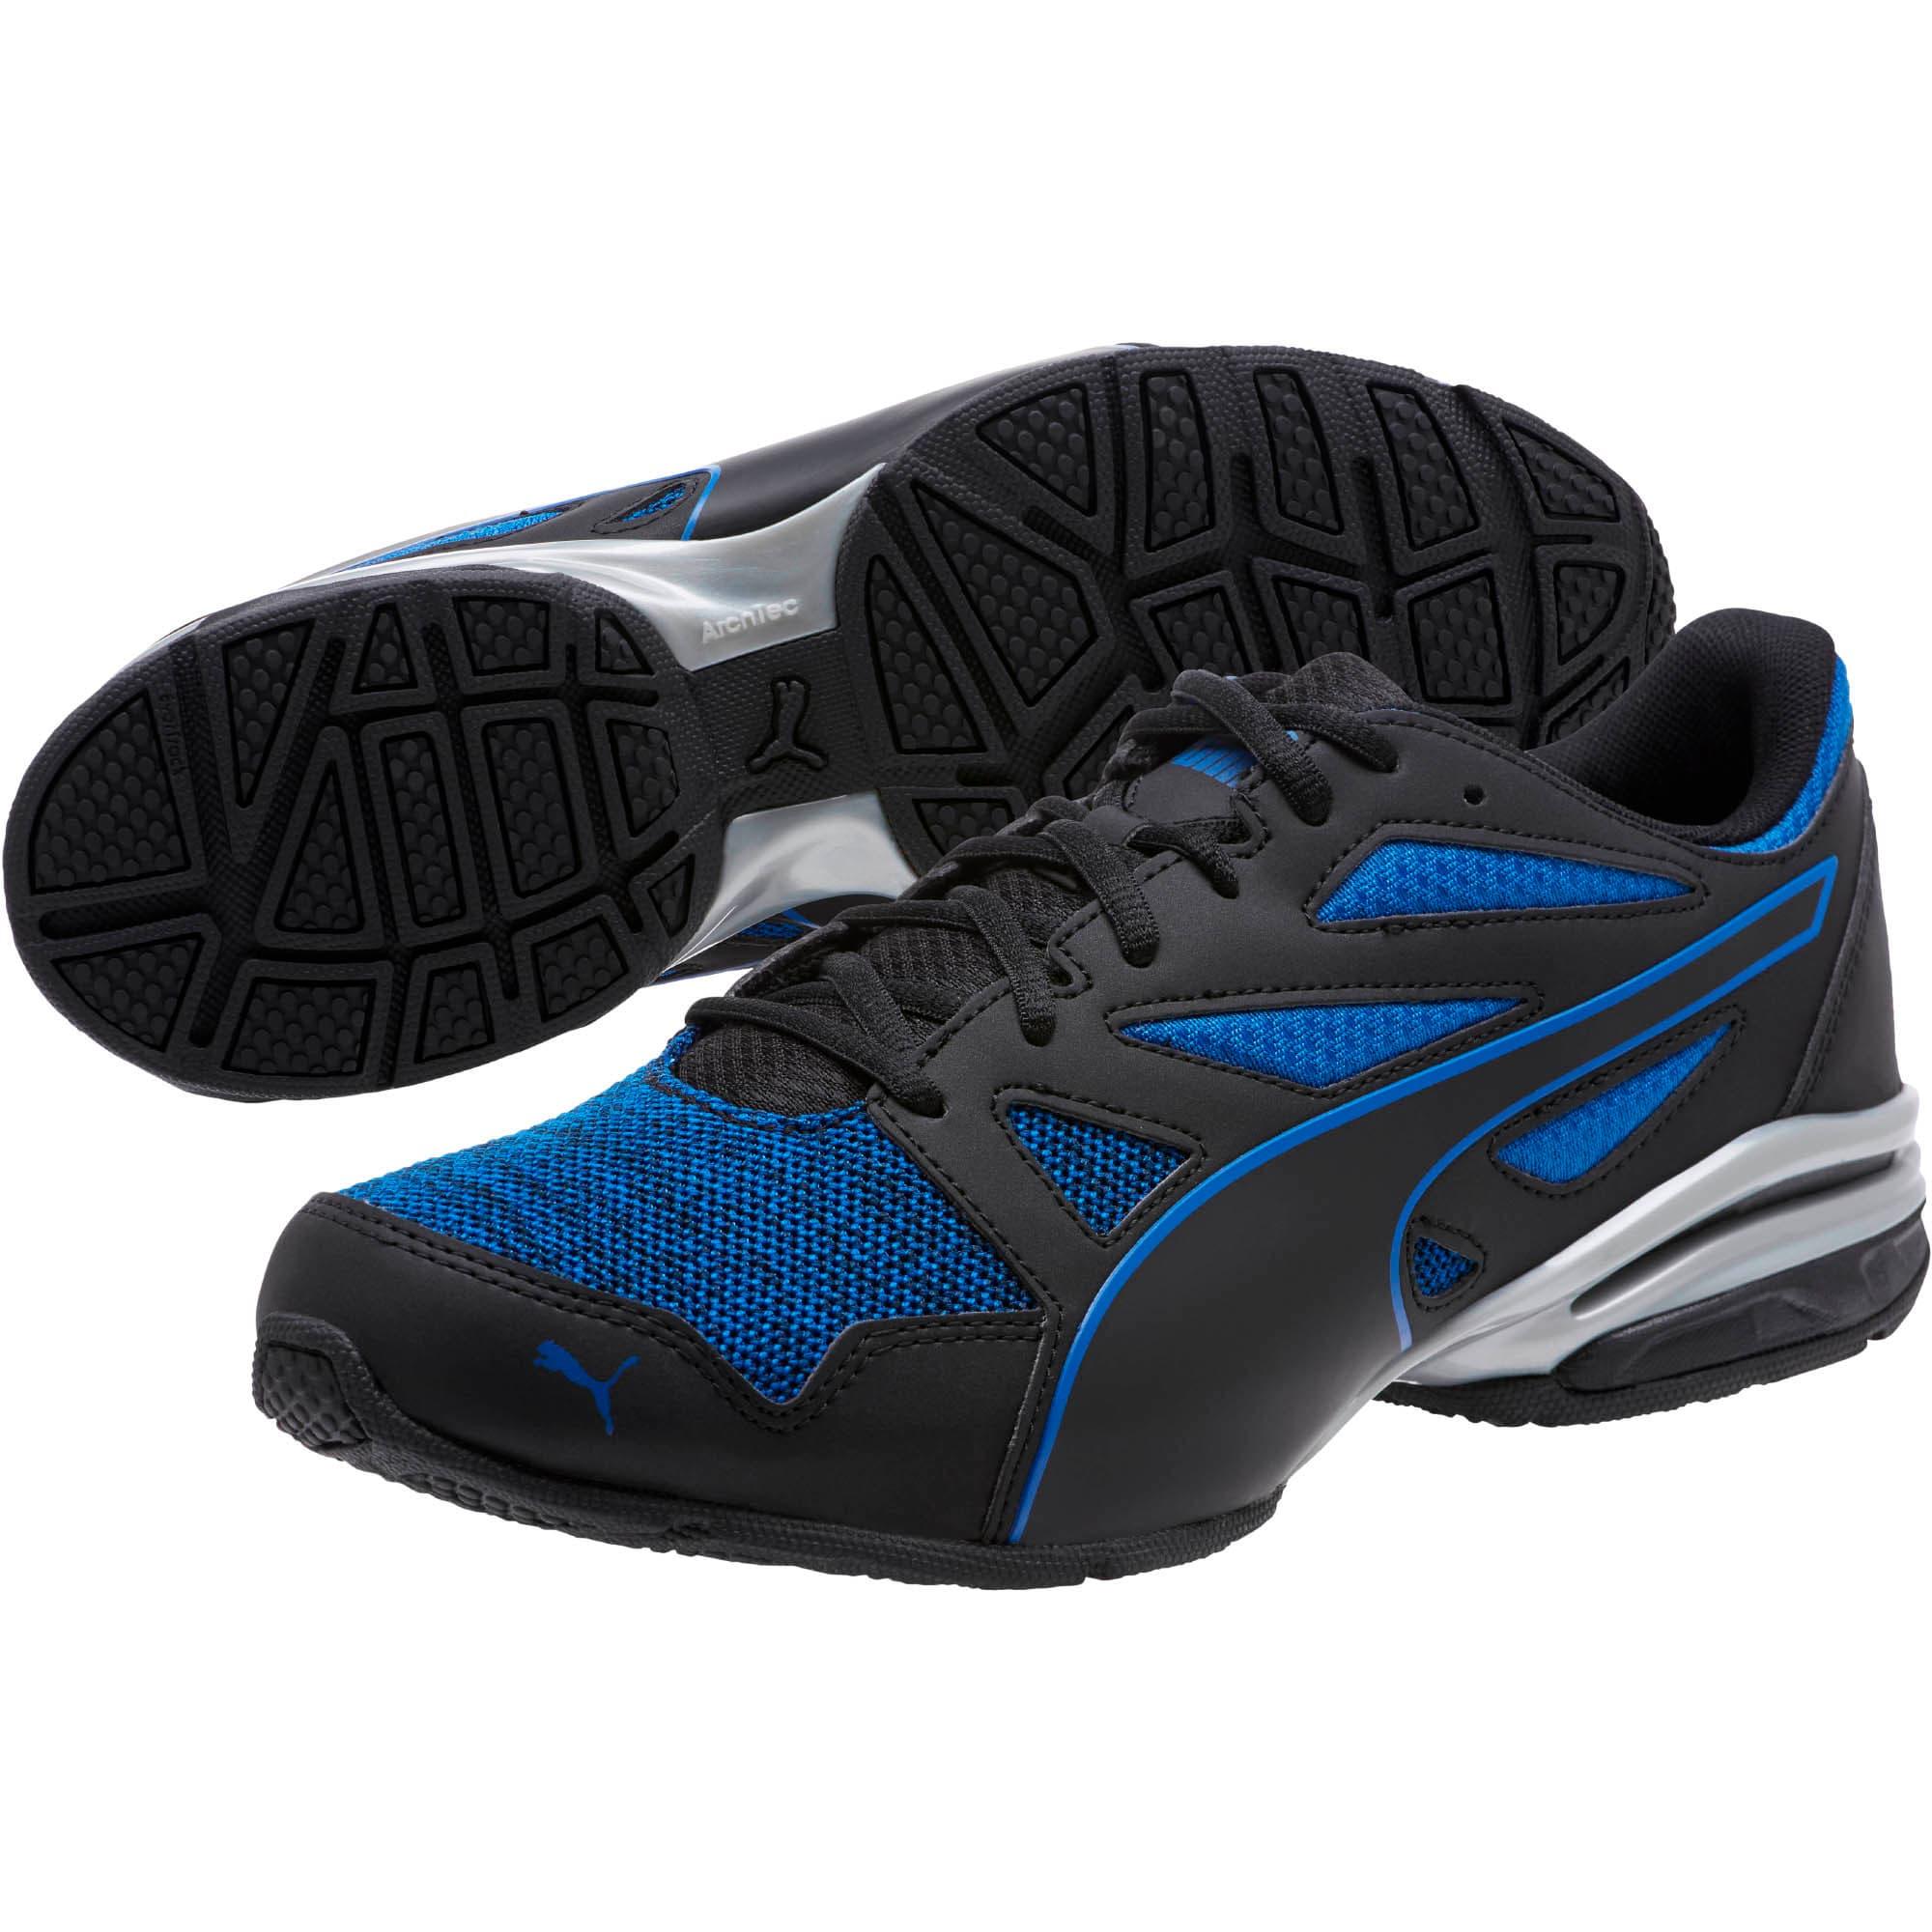 Thumbnail 2 of Tazon Modern Heather Knit Men's Sneakers, Puma Black-Turkish Sea, medium